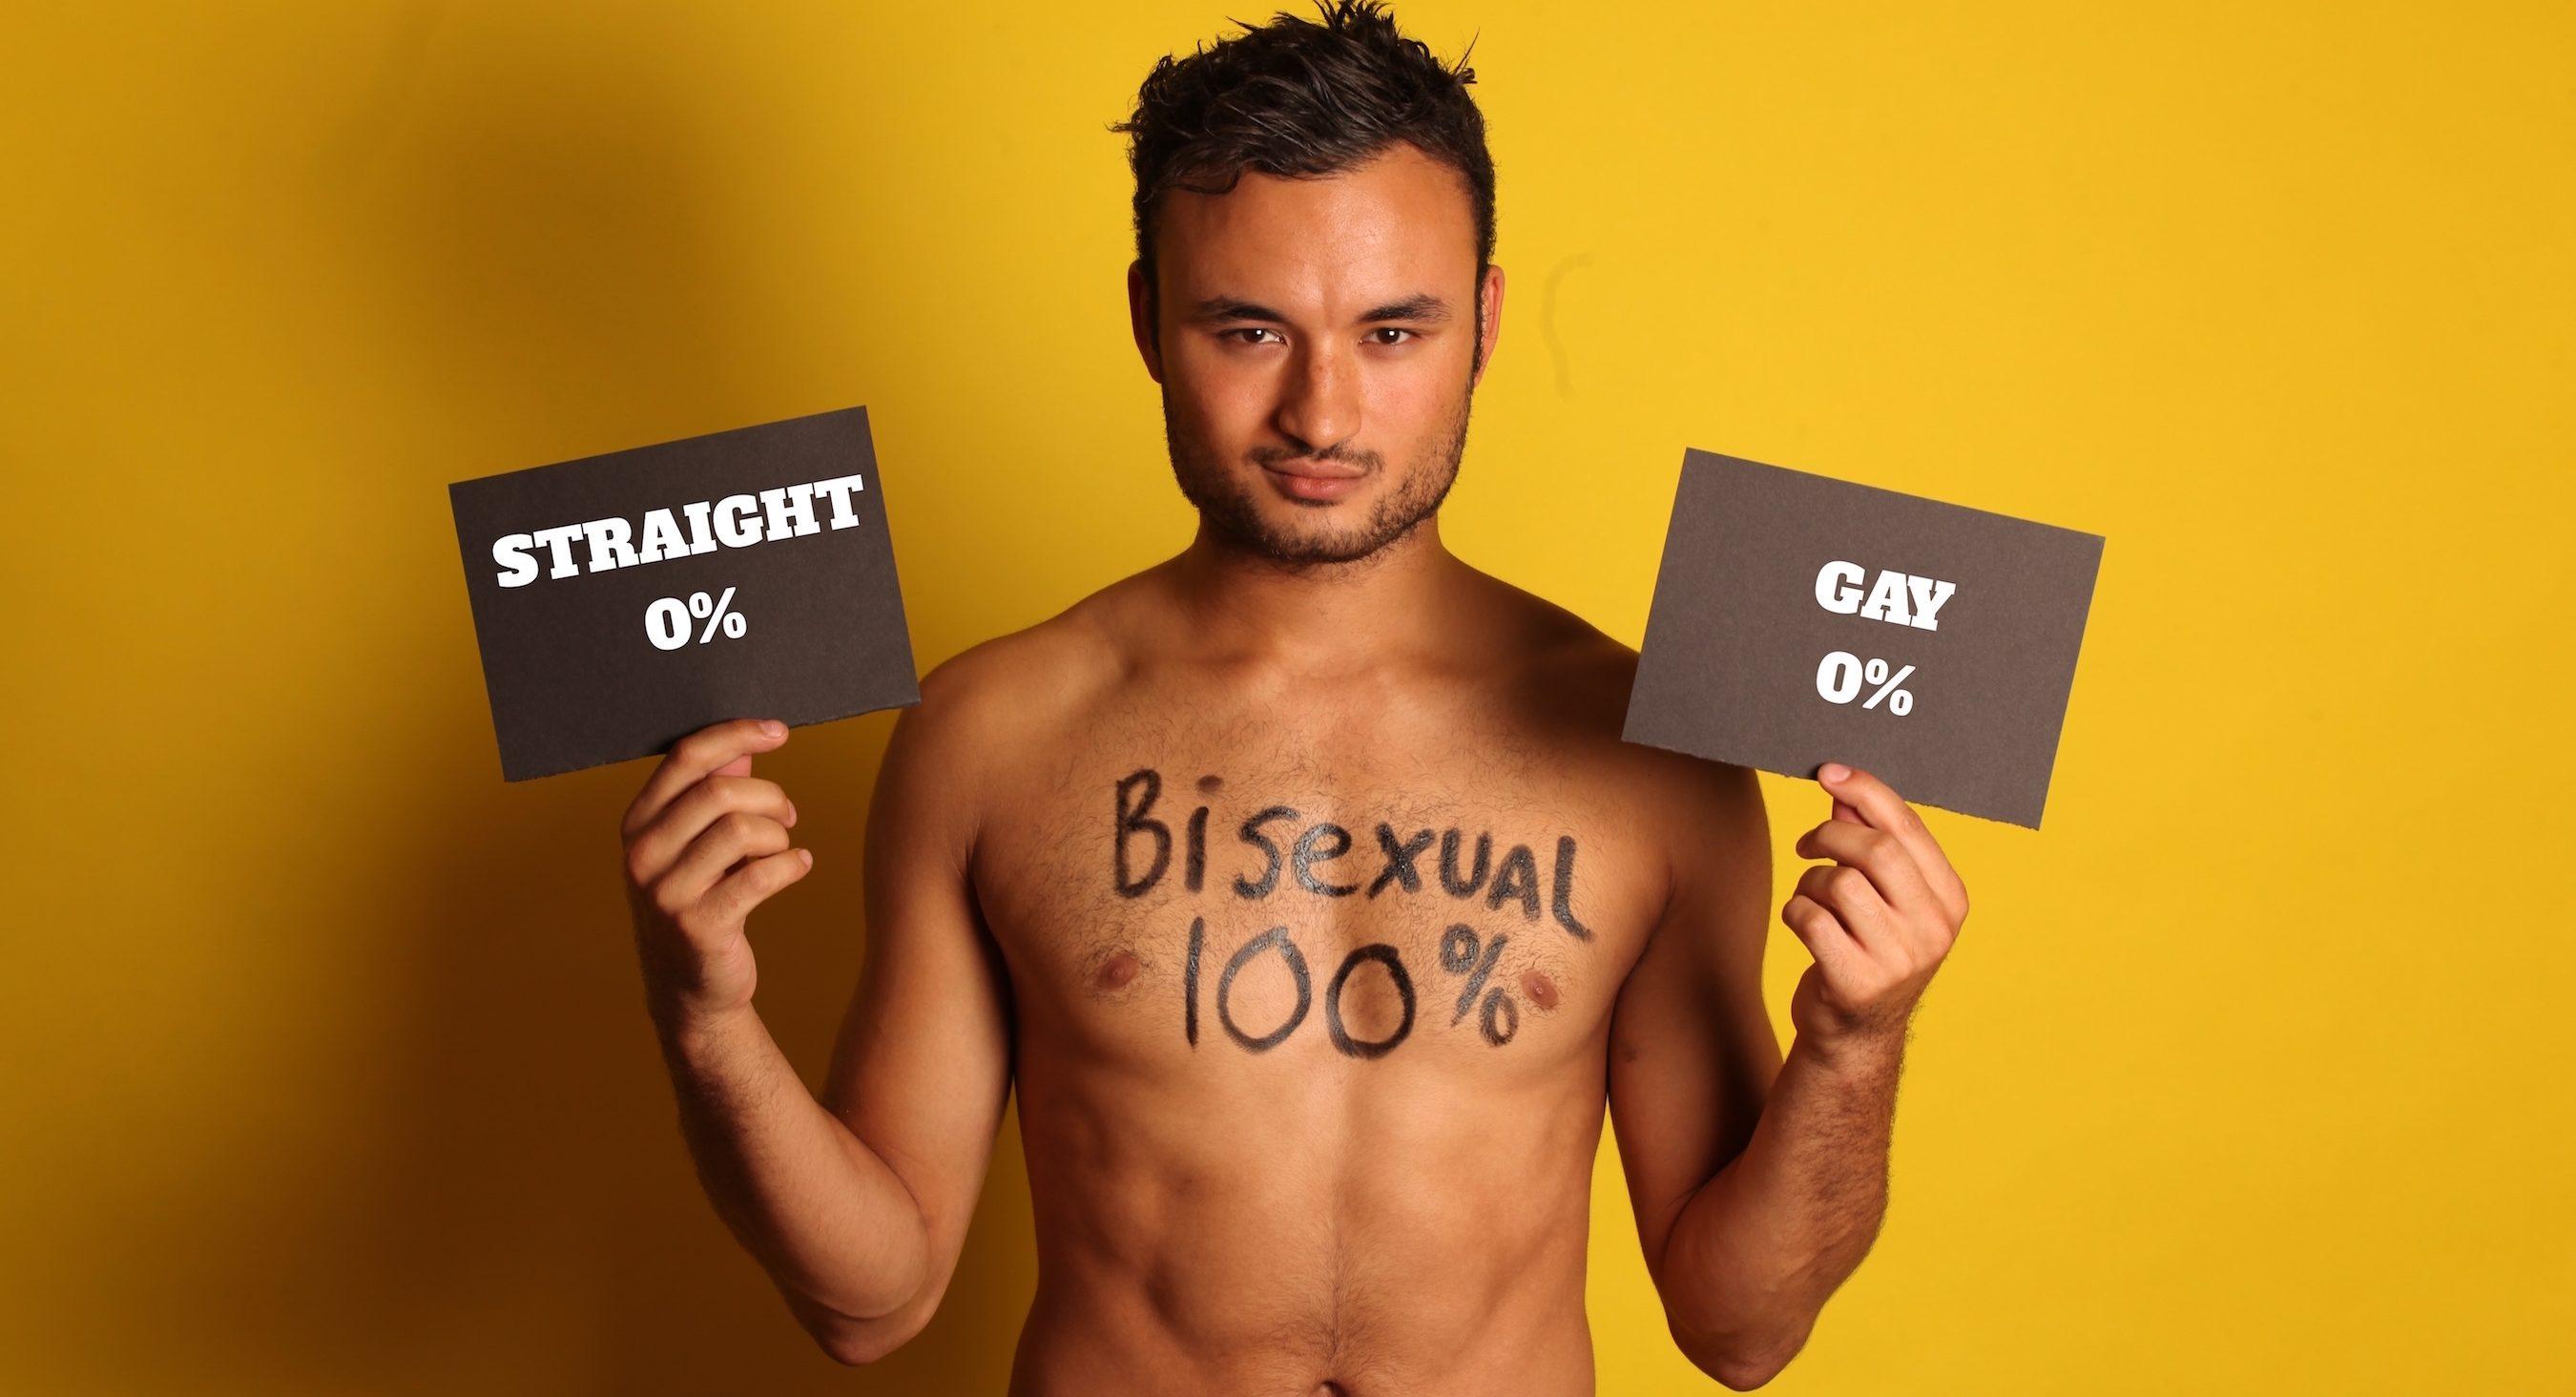 Gay courses